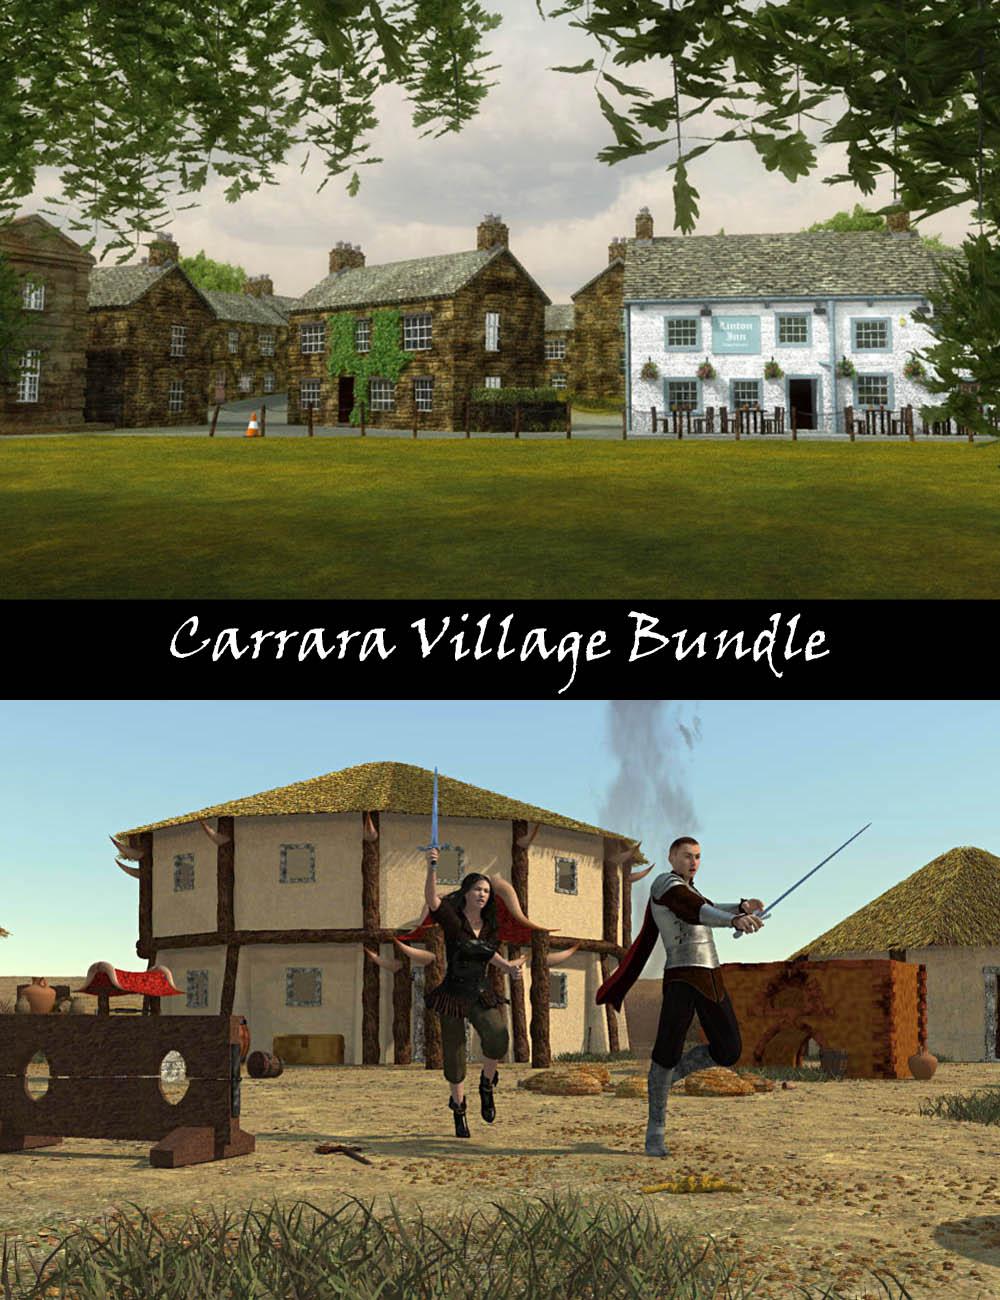 Carrara Village Bundle by: PhilW, 3D Models by Daz 3D